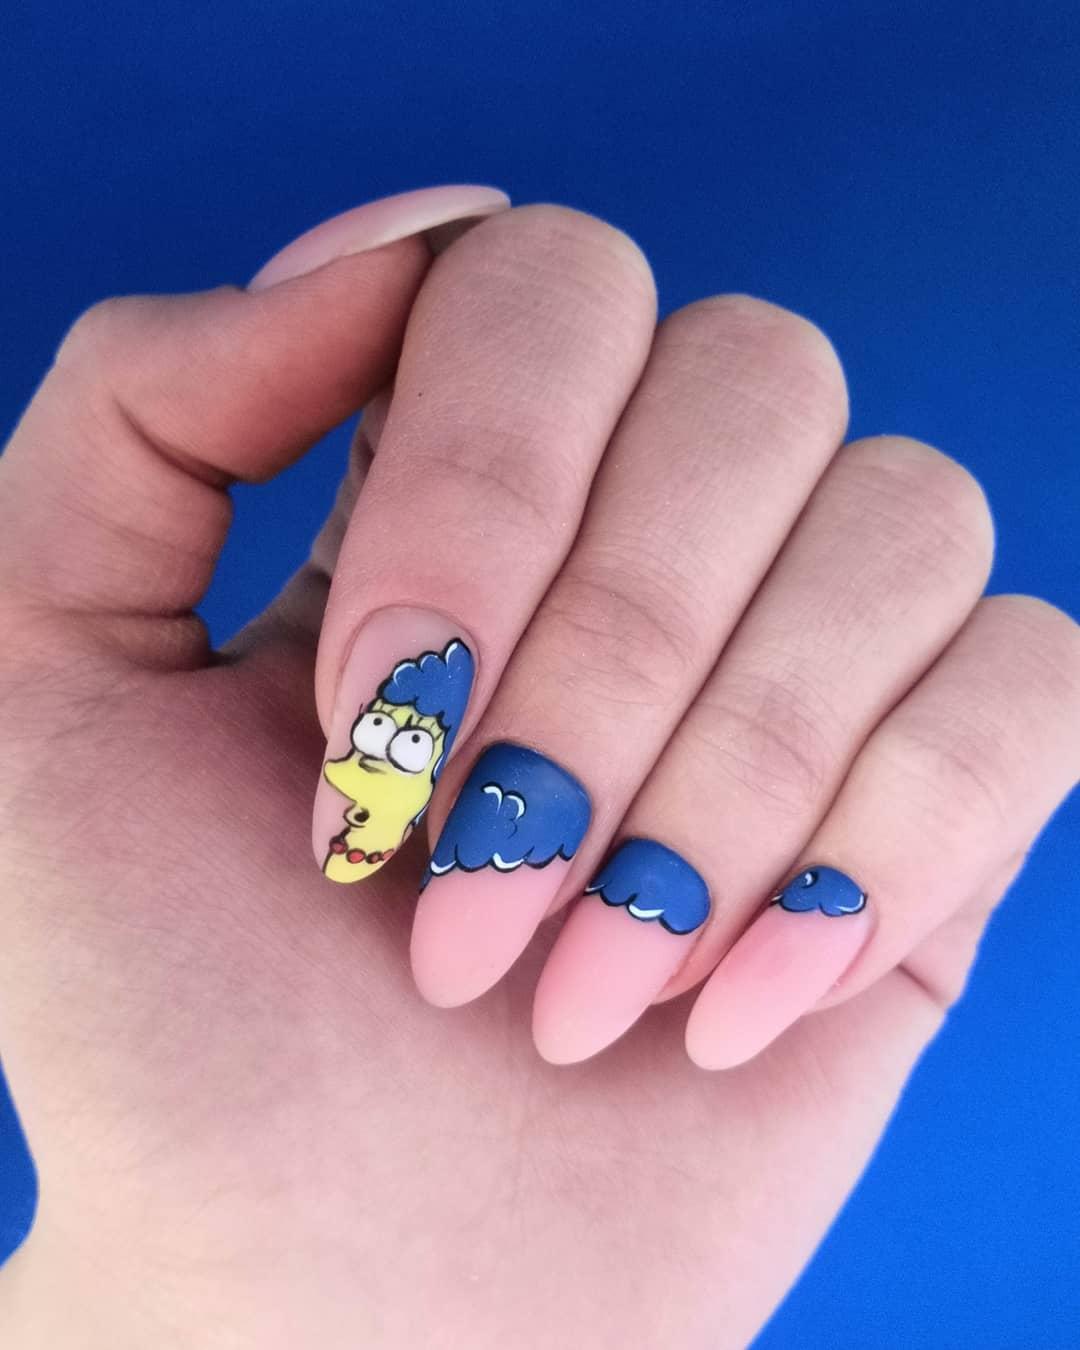 Симпсоны на ногтях, ручная роспись